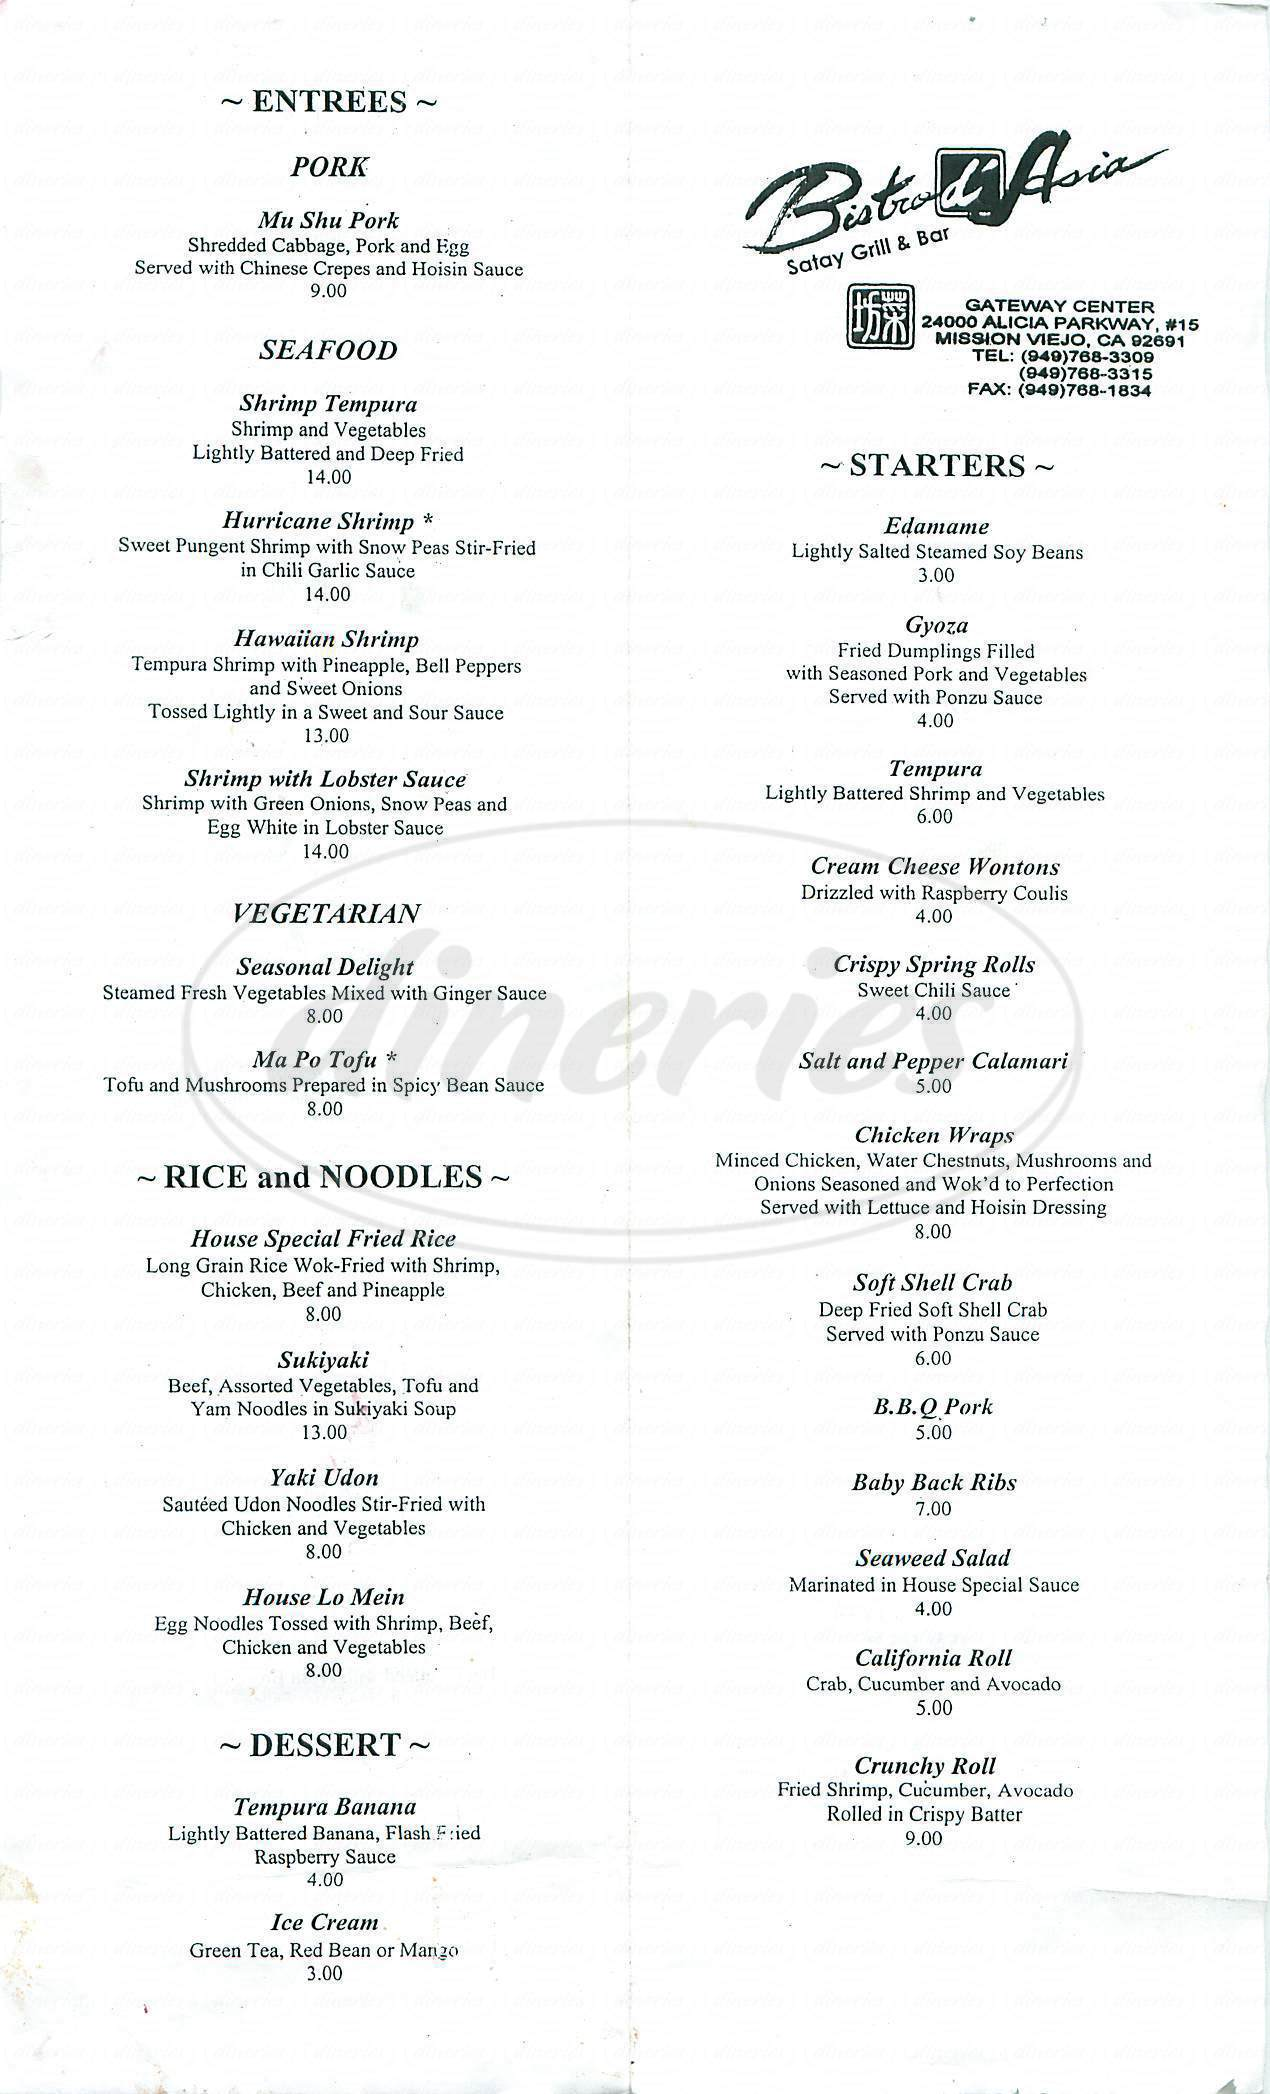 menu for Bistro d' Asia